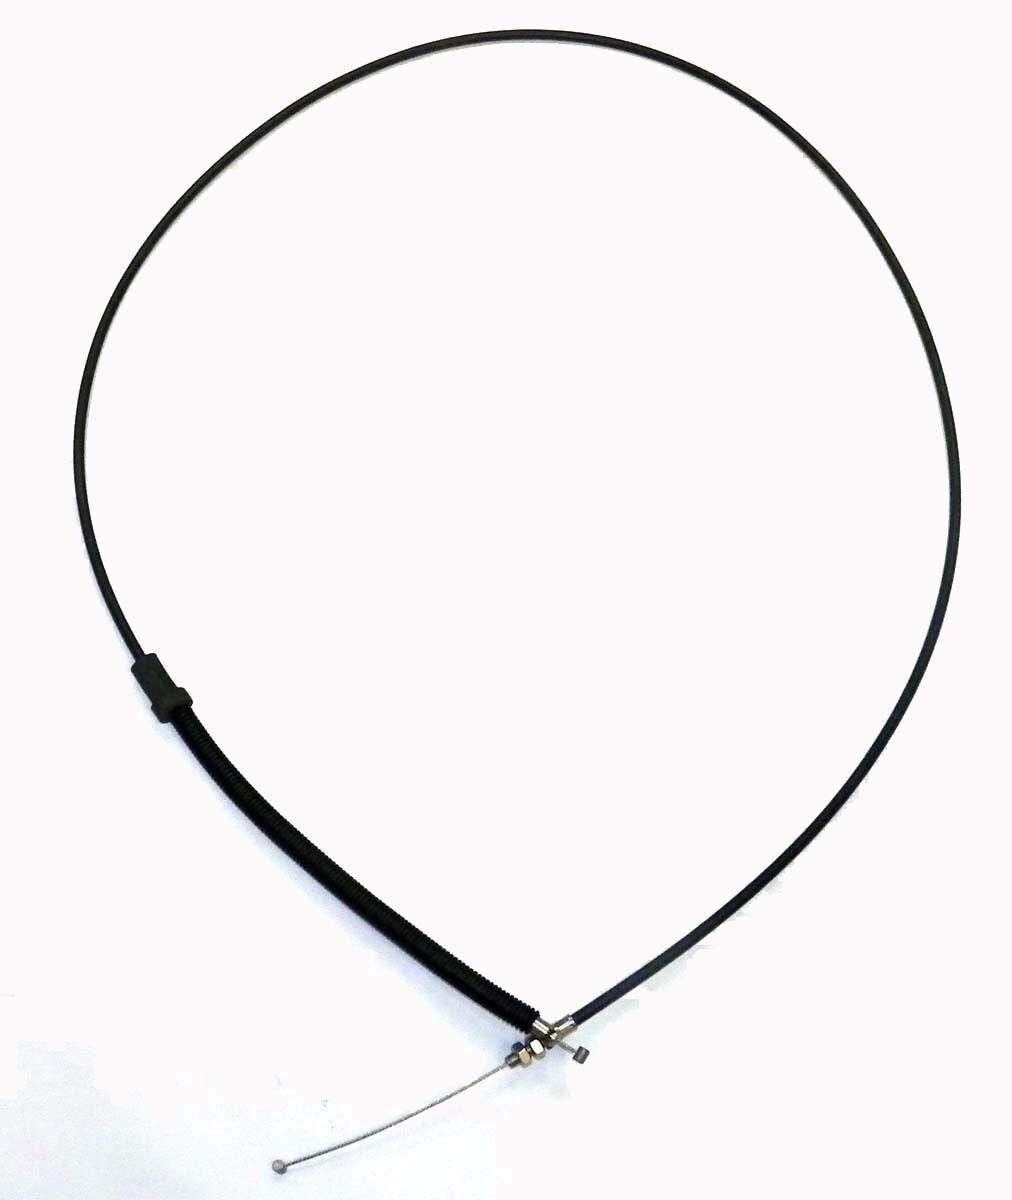 Trim Cable Upper Yamaha GP 760/800/1200 PWC GP7-U153D-00-00 002-052-01